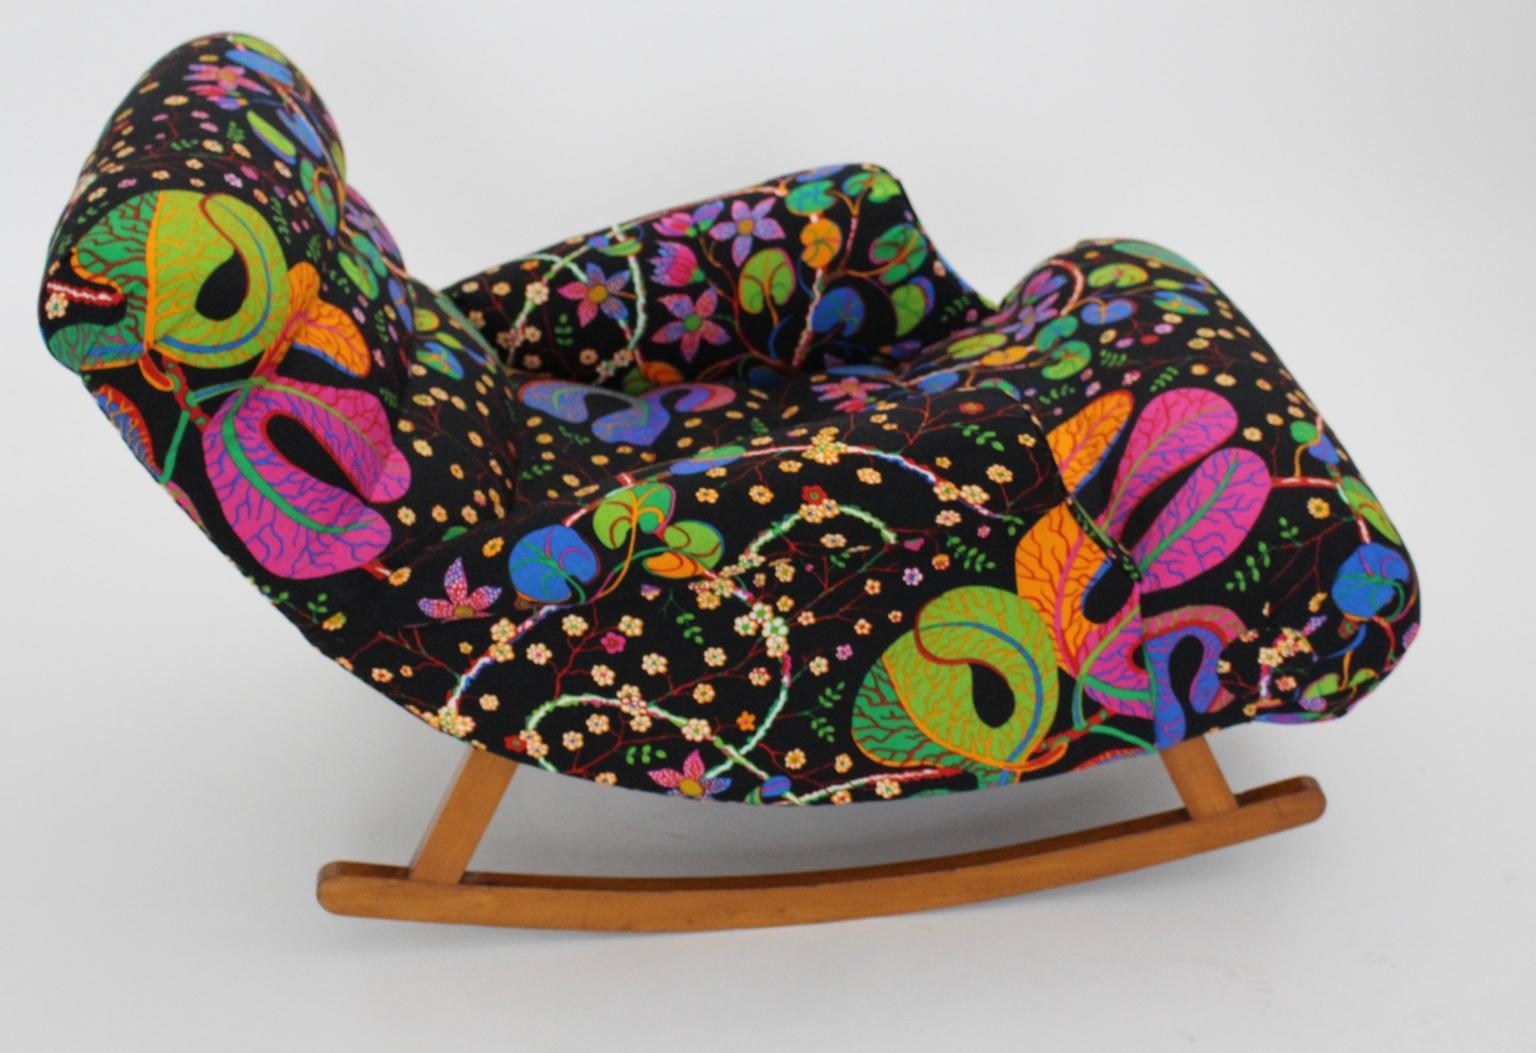 Art Deco Periods & Styles Careful Art Deco Chrome Rocking Chair